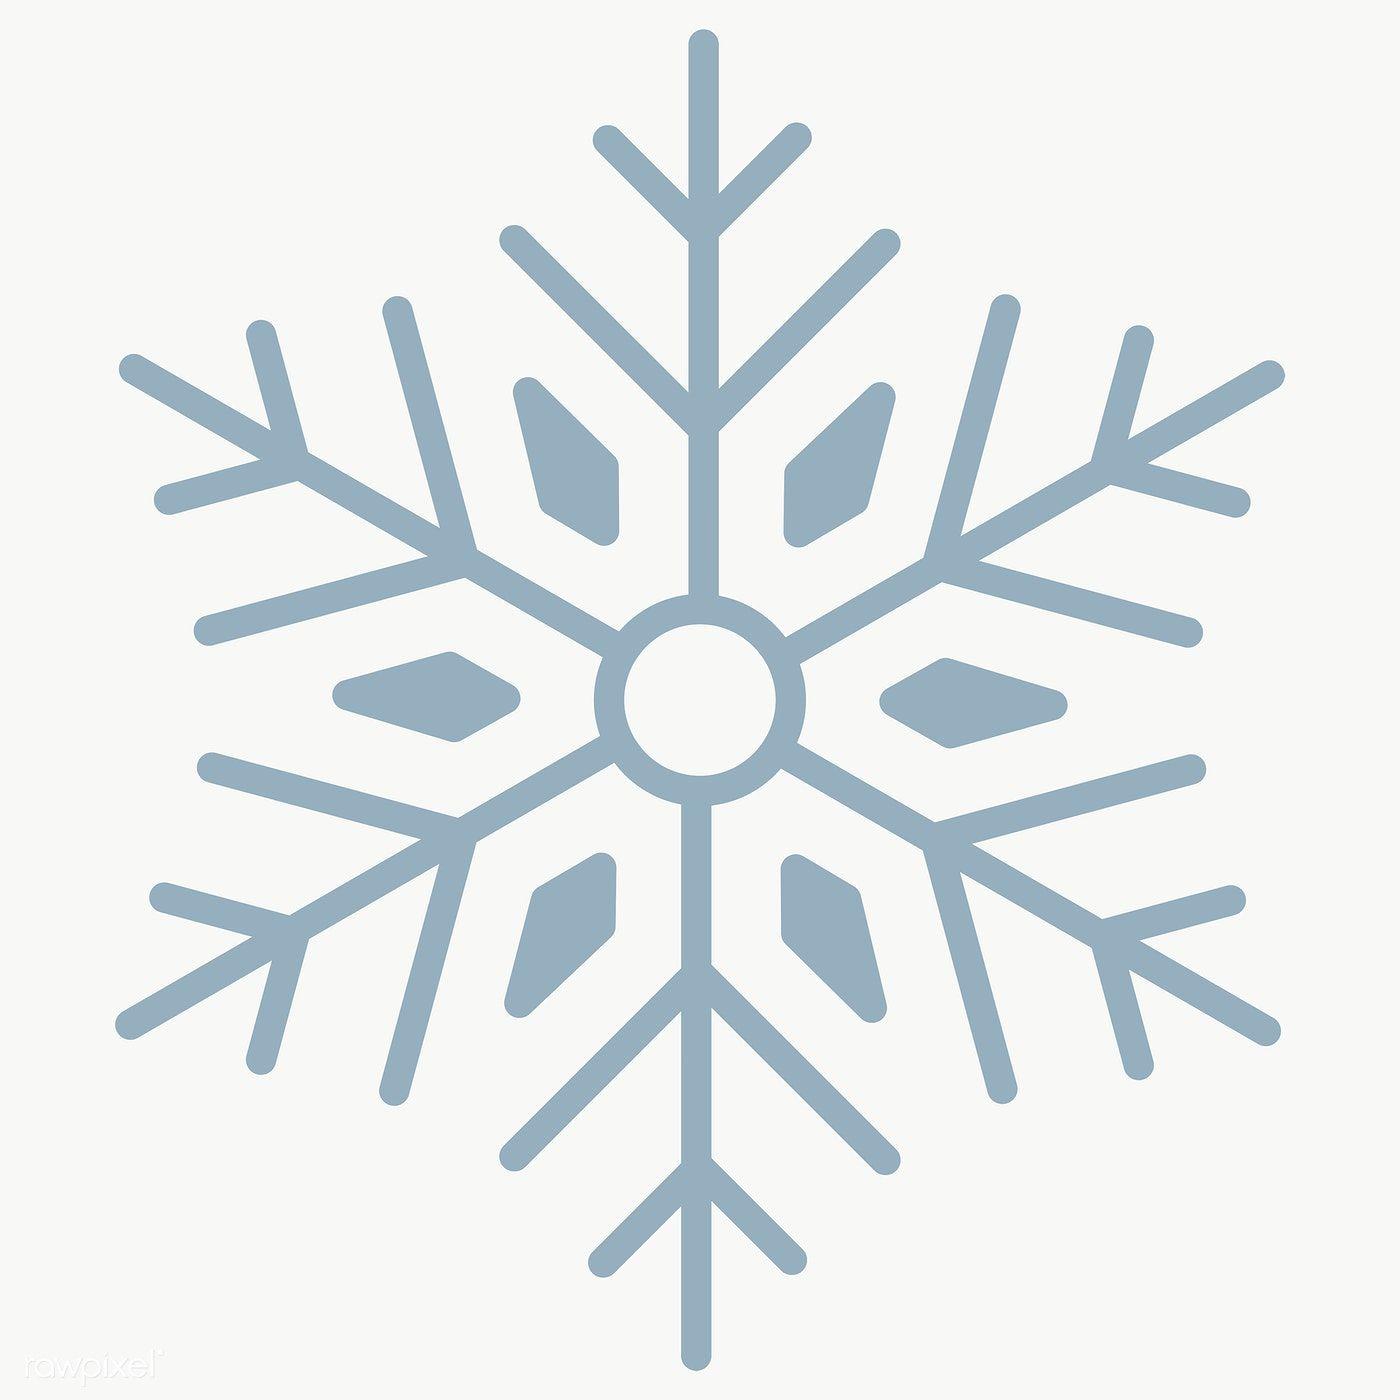 Snowflake Christmas Social Ads Template Transparent Png Premium Image By Rawpixel Com Sasi Snowflakes Snowflake Images Social Ads